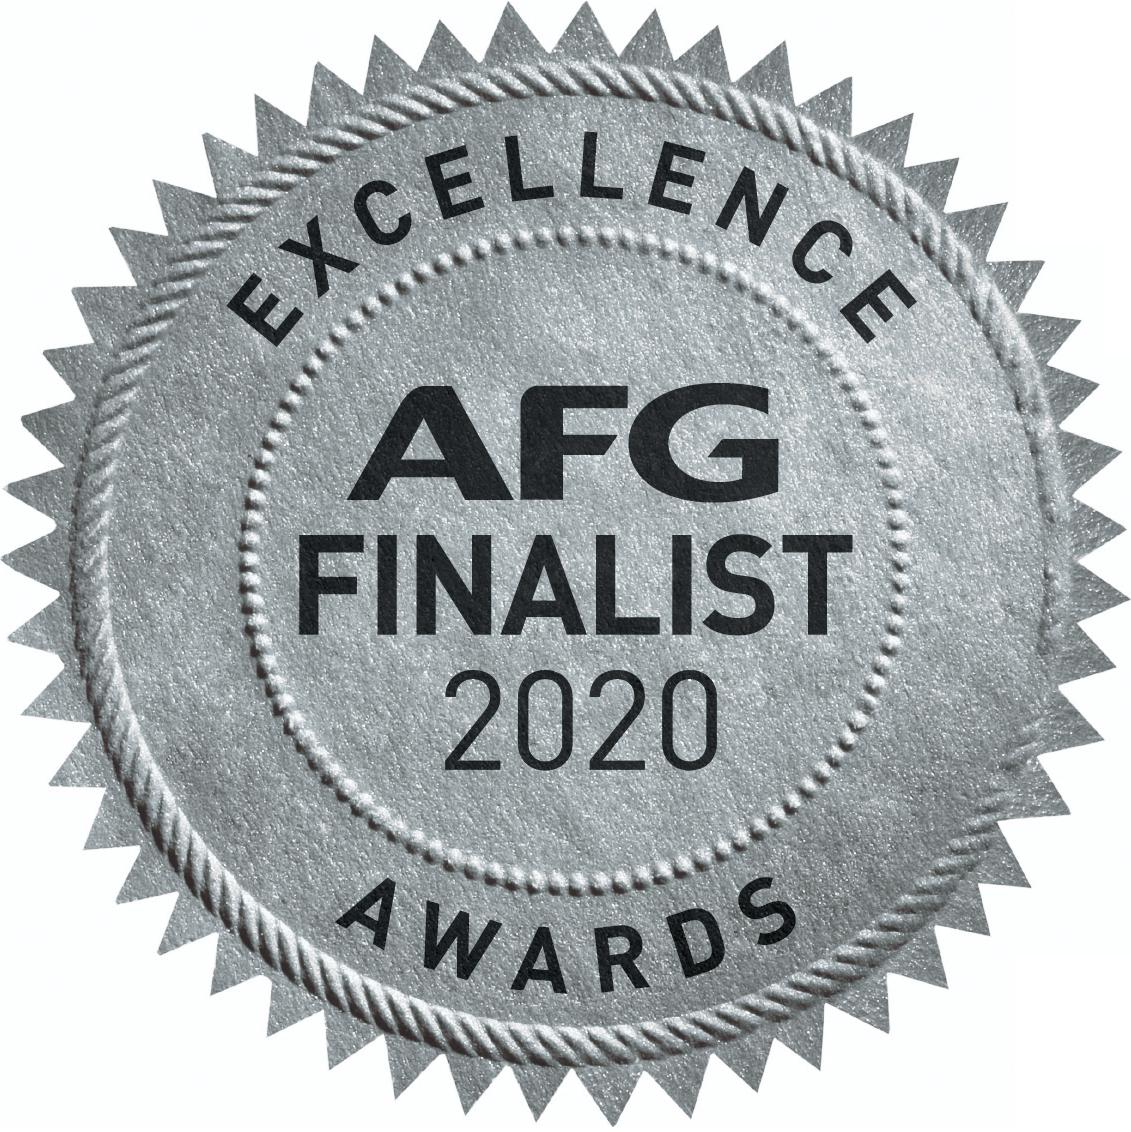 Excellence - AFG Finalist 2020